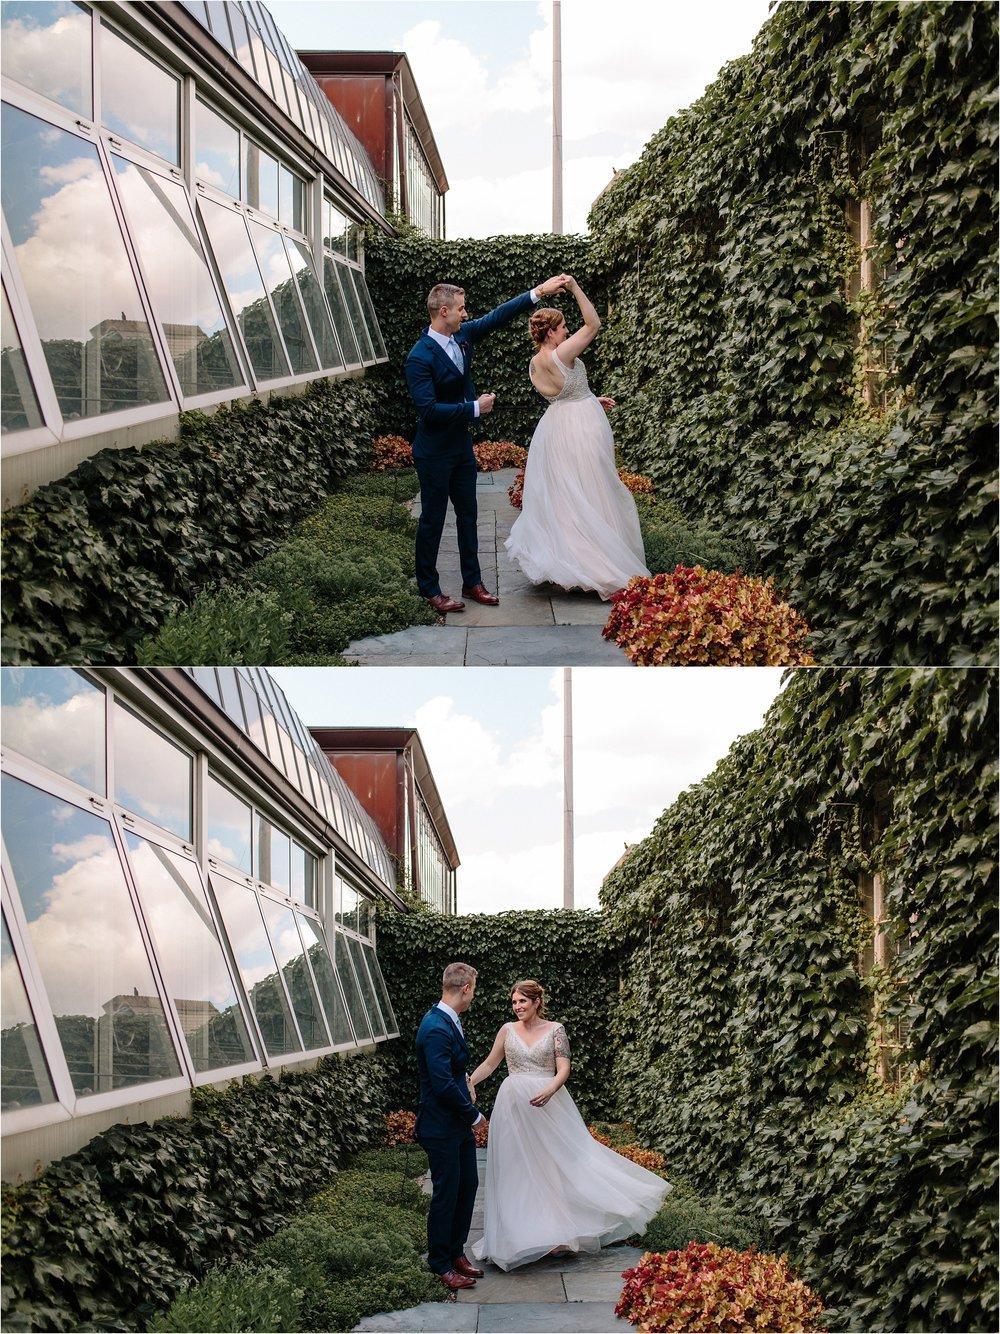 garfield-park-conservatory-wedding-154.jpg